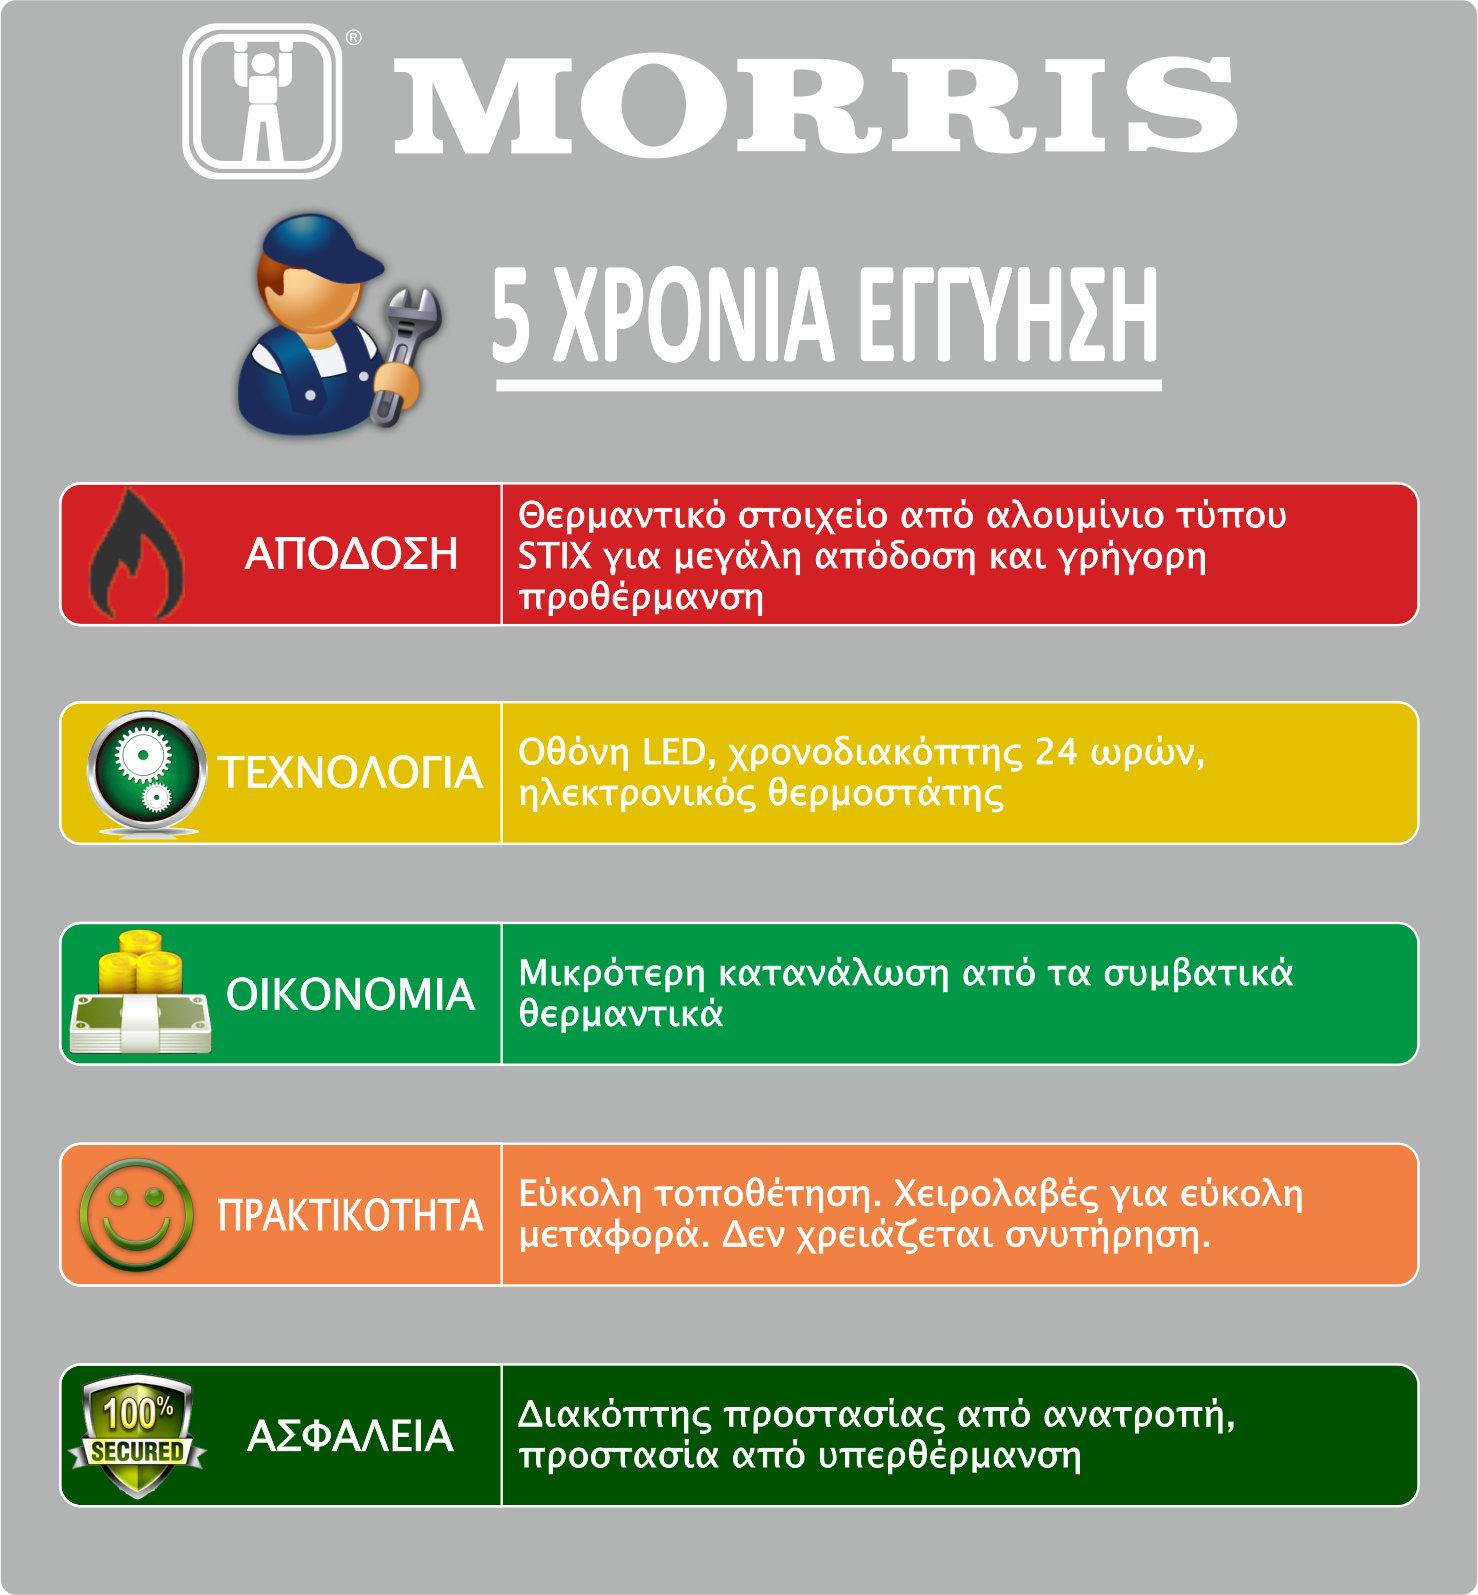 MORRIS MCH-20018 ΘΕΡΜΑΝΤΙΚΟ ΠΑΝΕΛ CONVECTOR 1800W